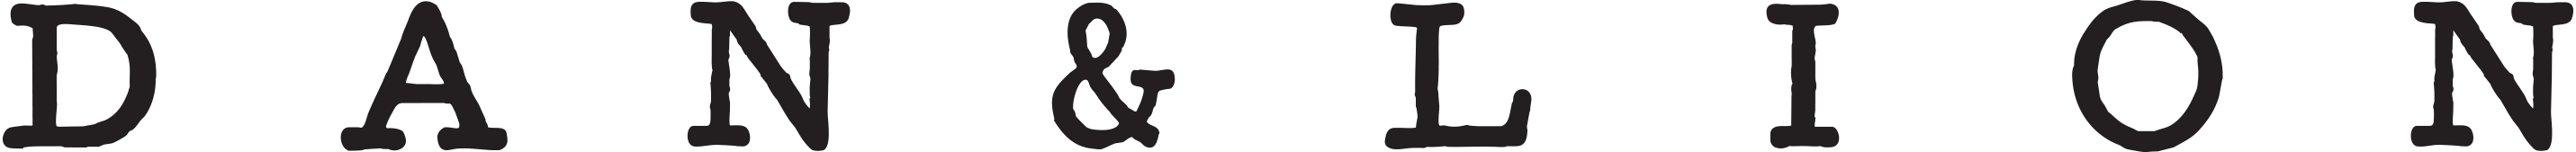 Dan_&_Lion_logo_homepage